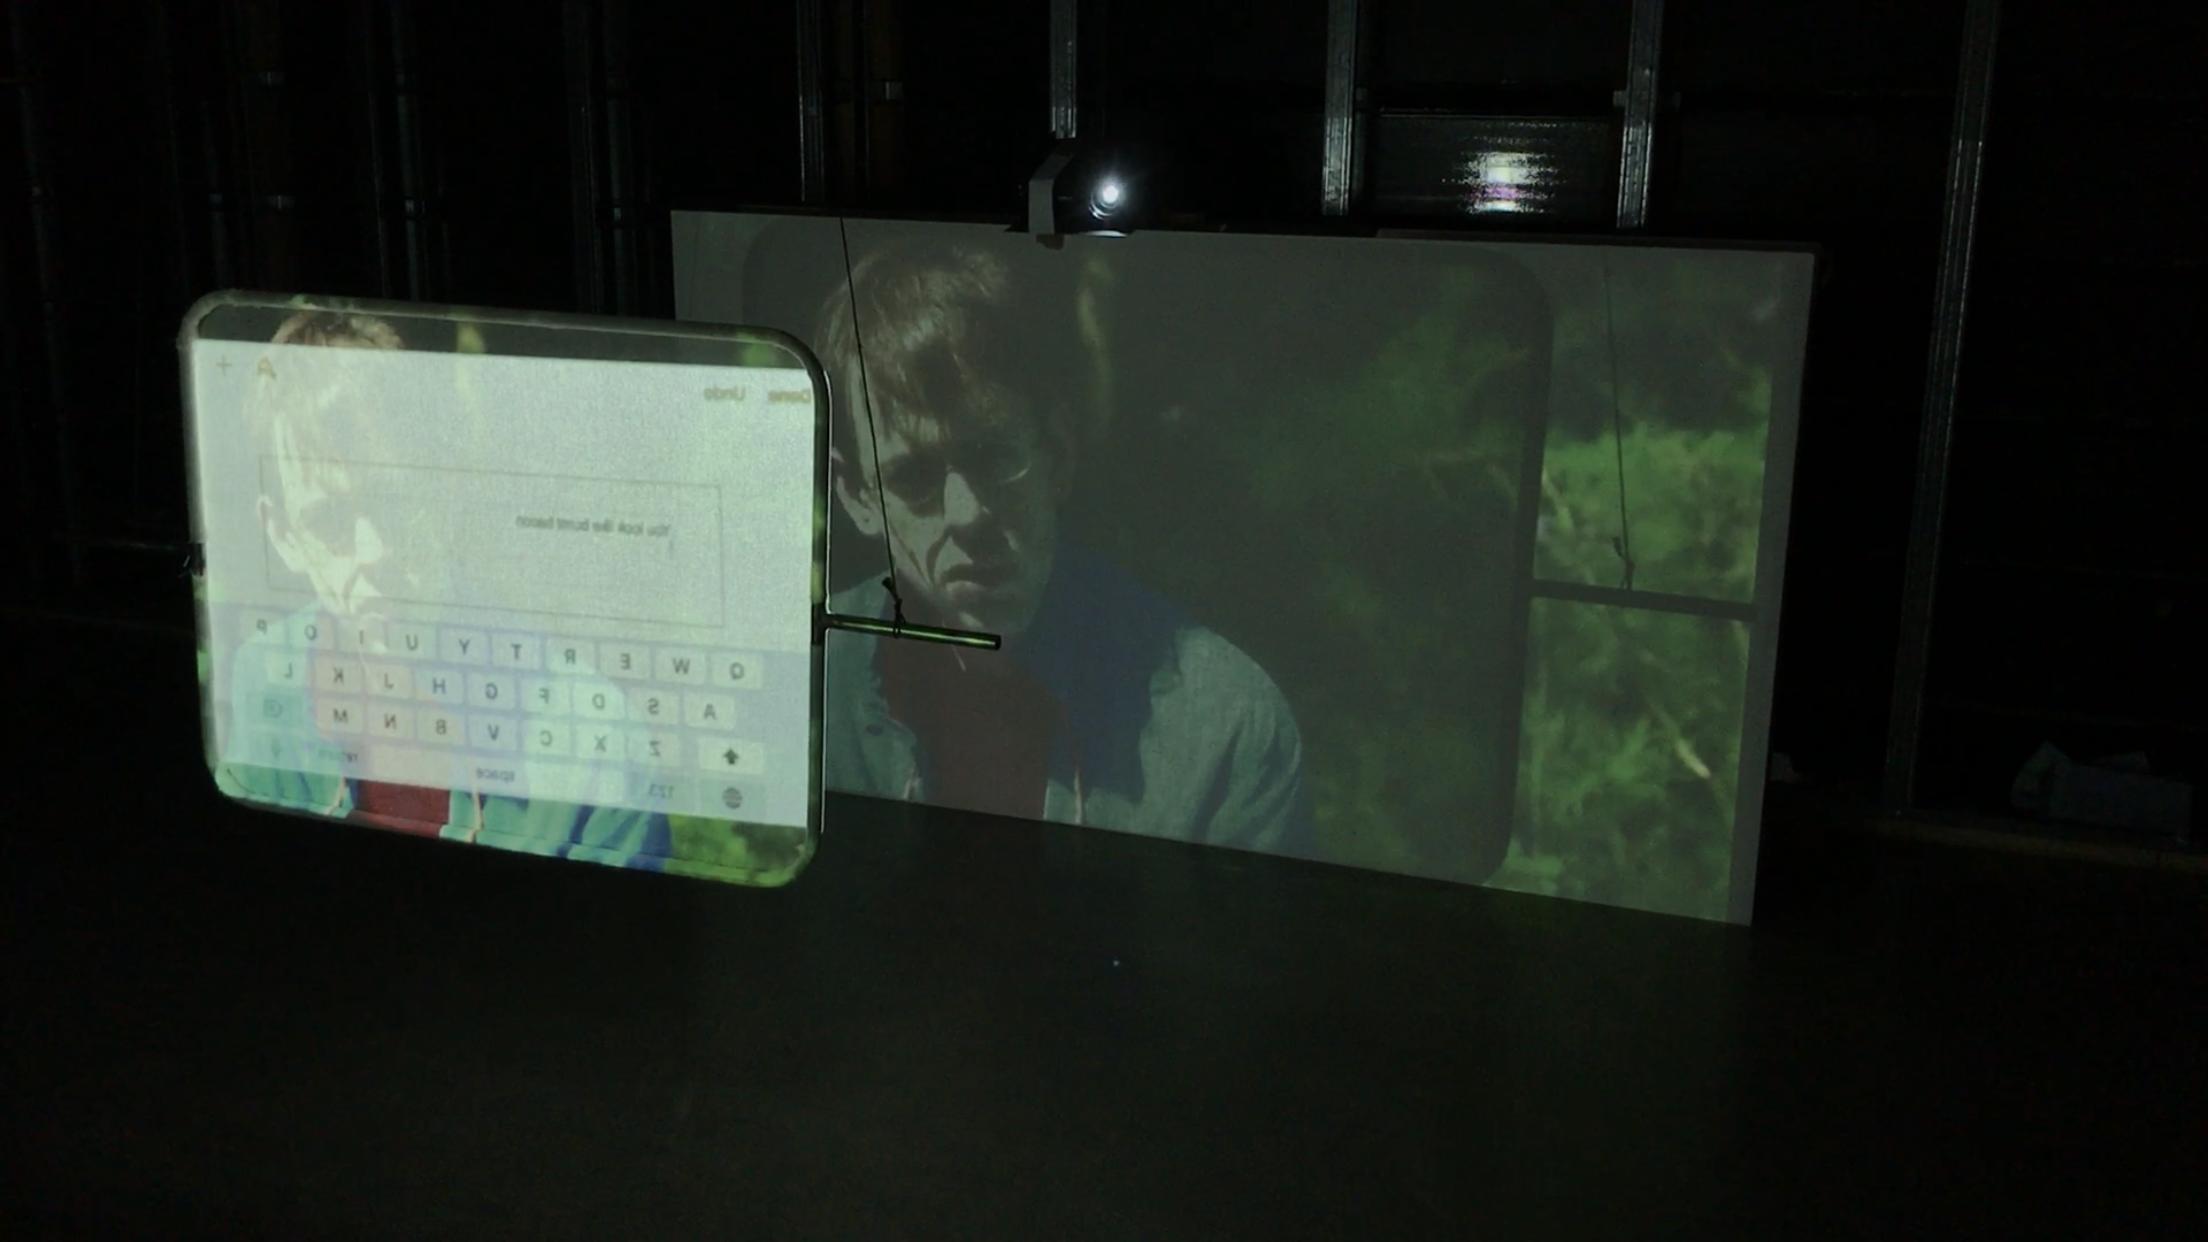 videoinstallation@dearhaters